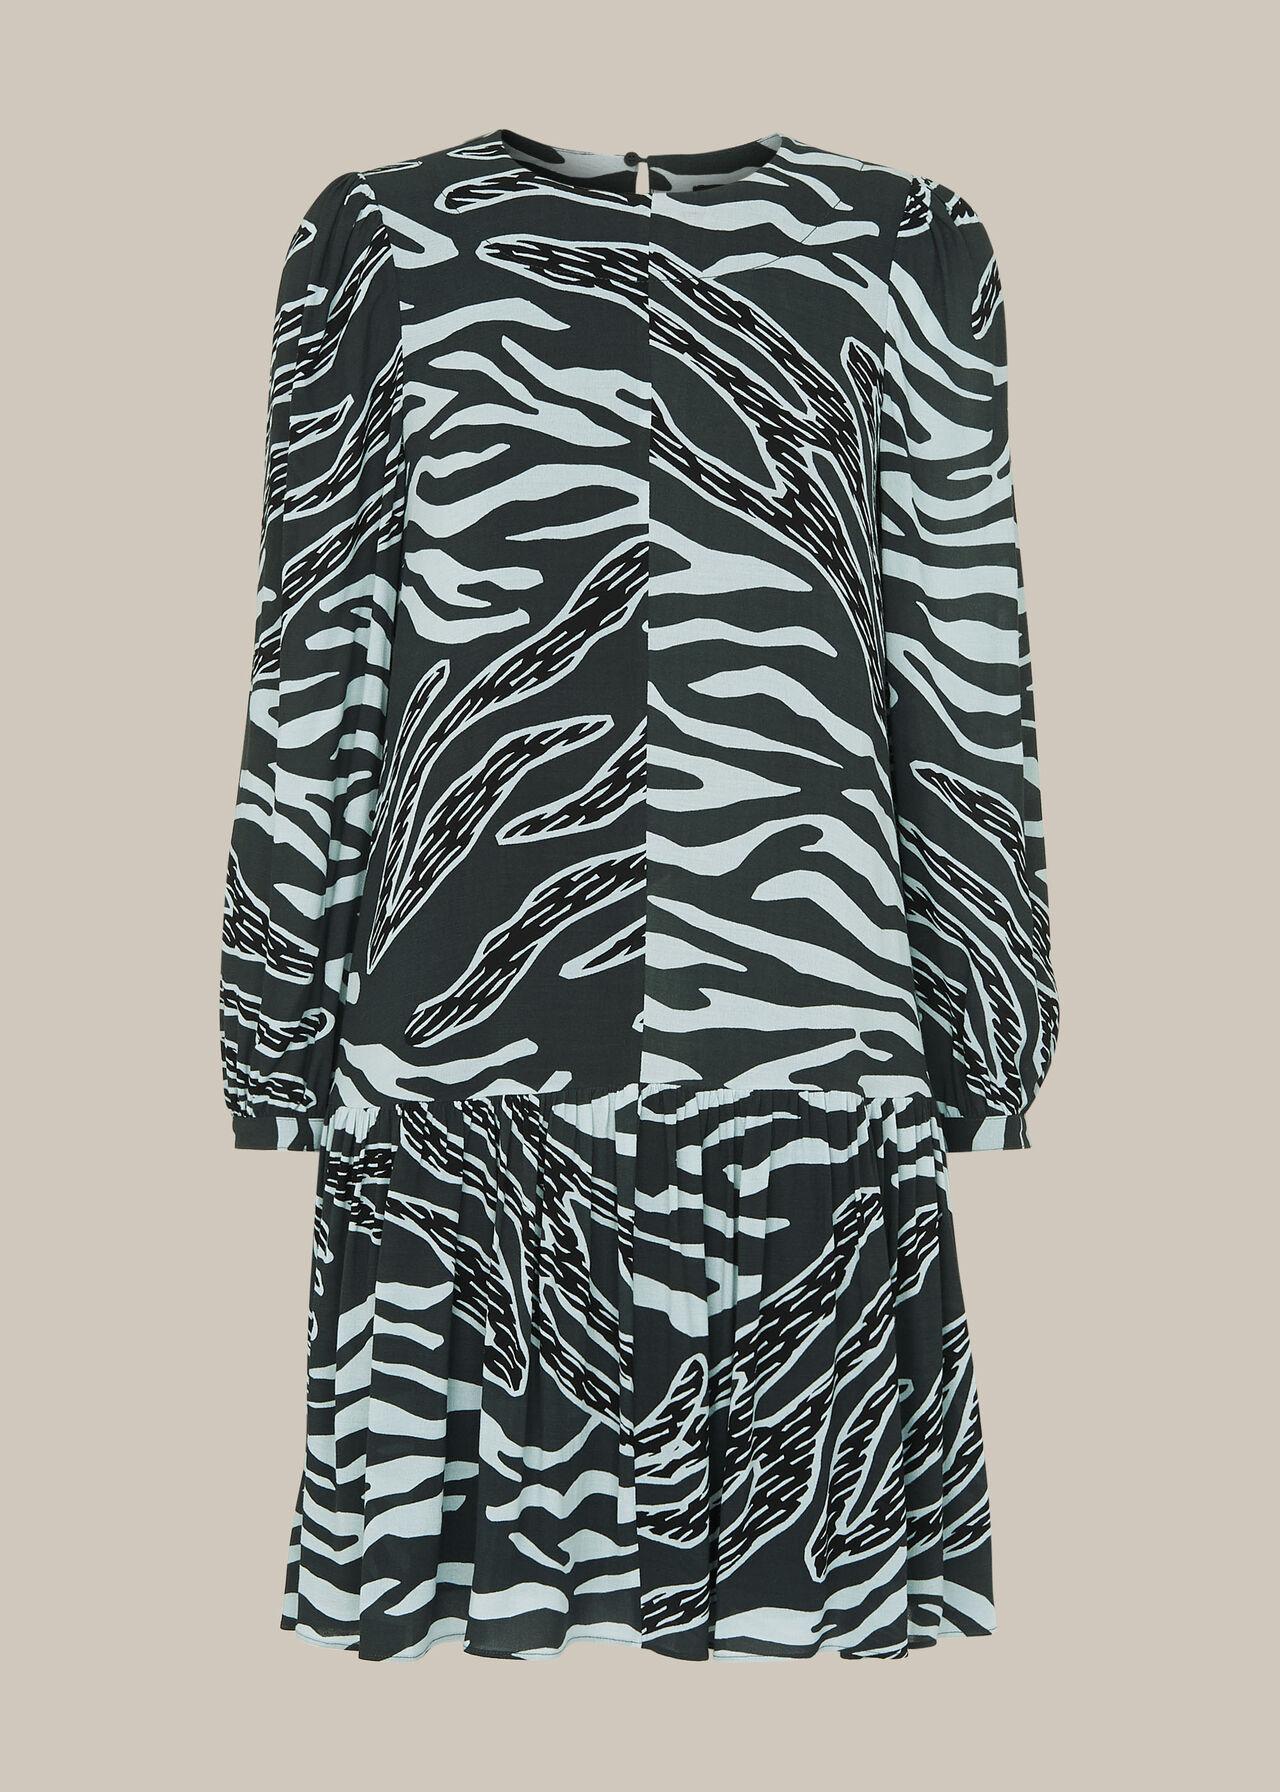 Graphic Zebra Print Dress